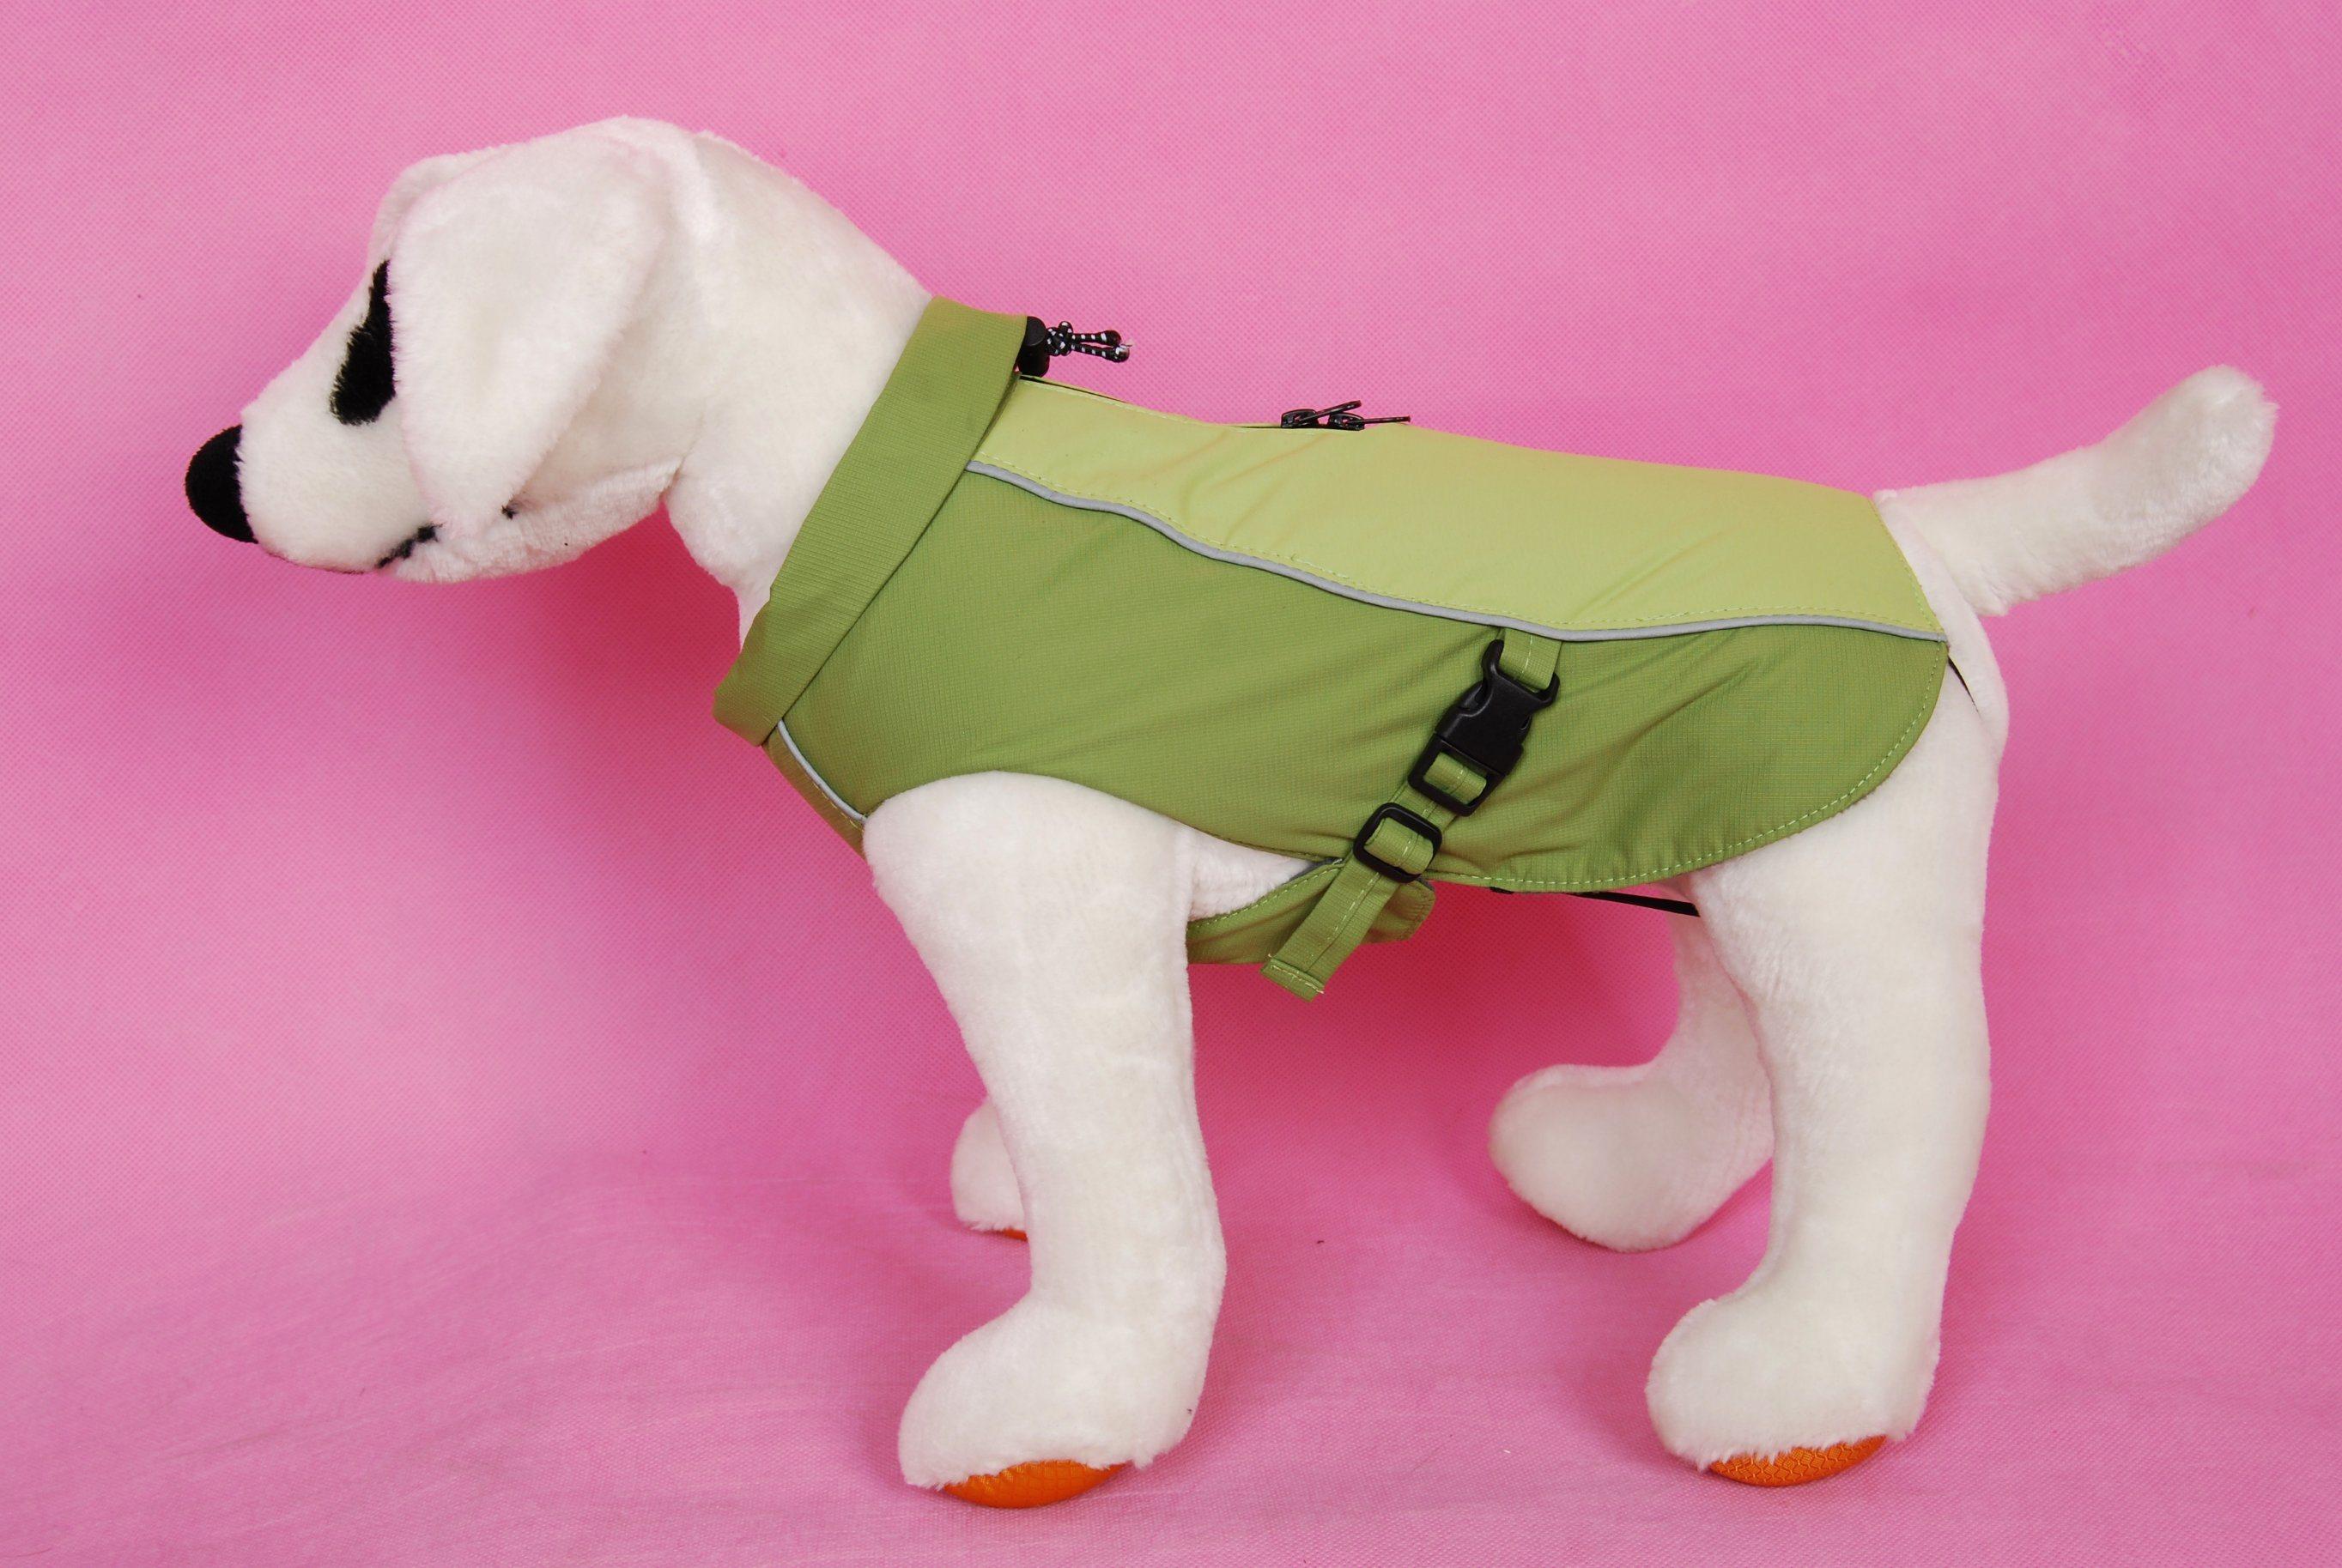 Detailed Analysis On The Waterproof Dog Jacket